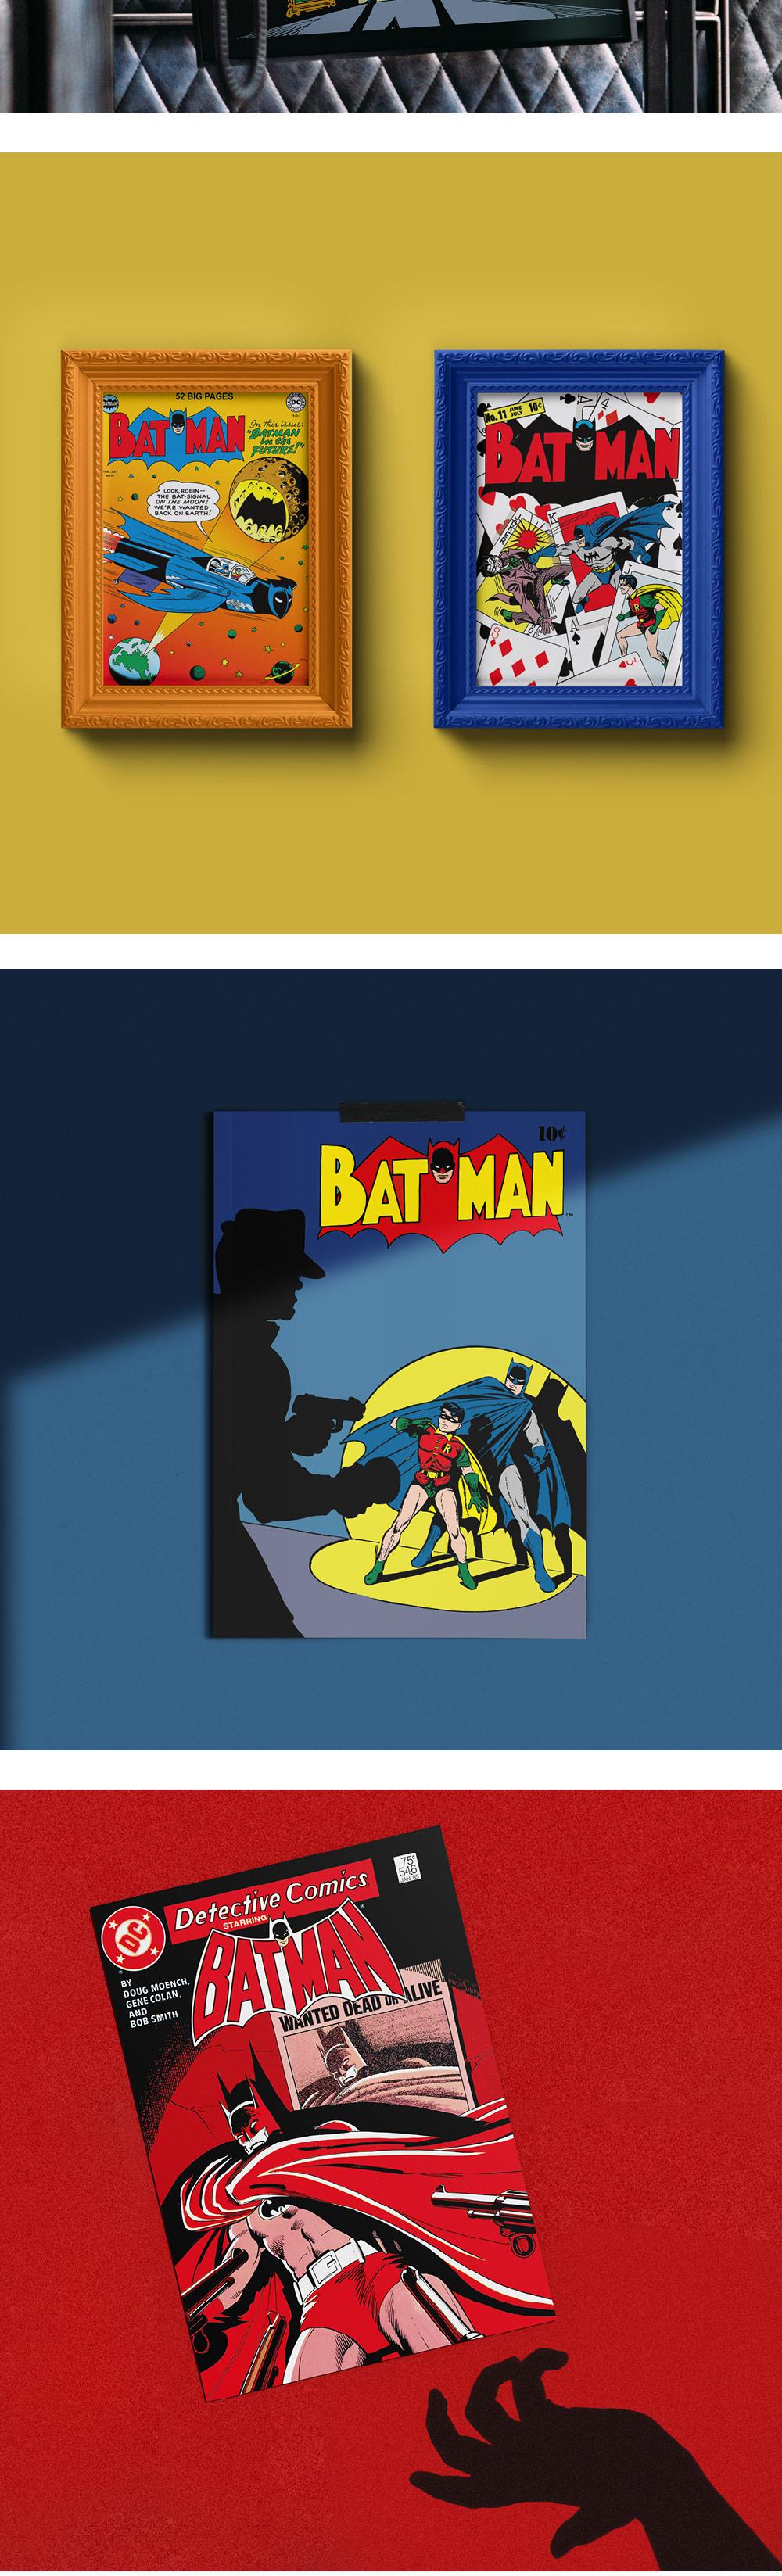 DC코믹스 인테리어 포스터_배트맨_04.jpg